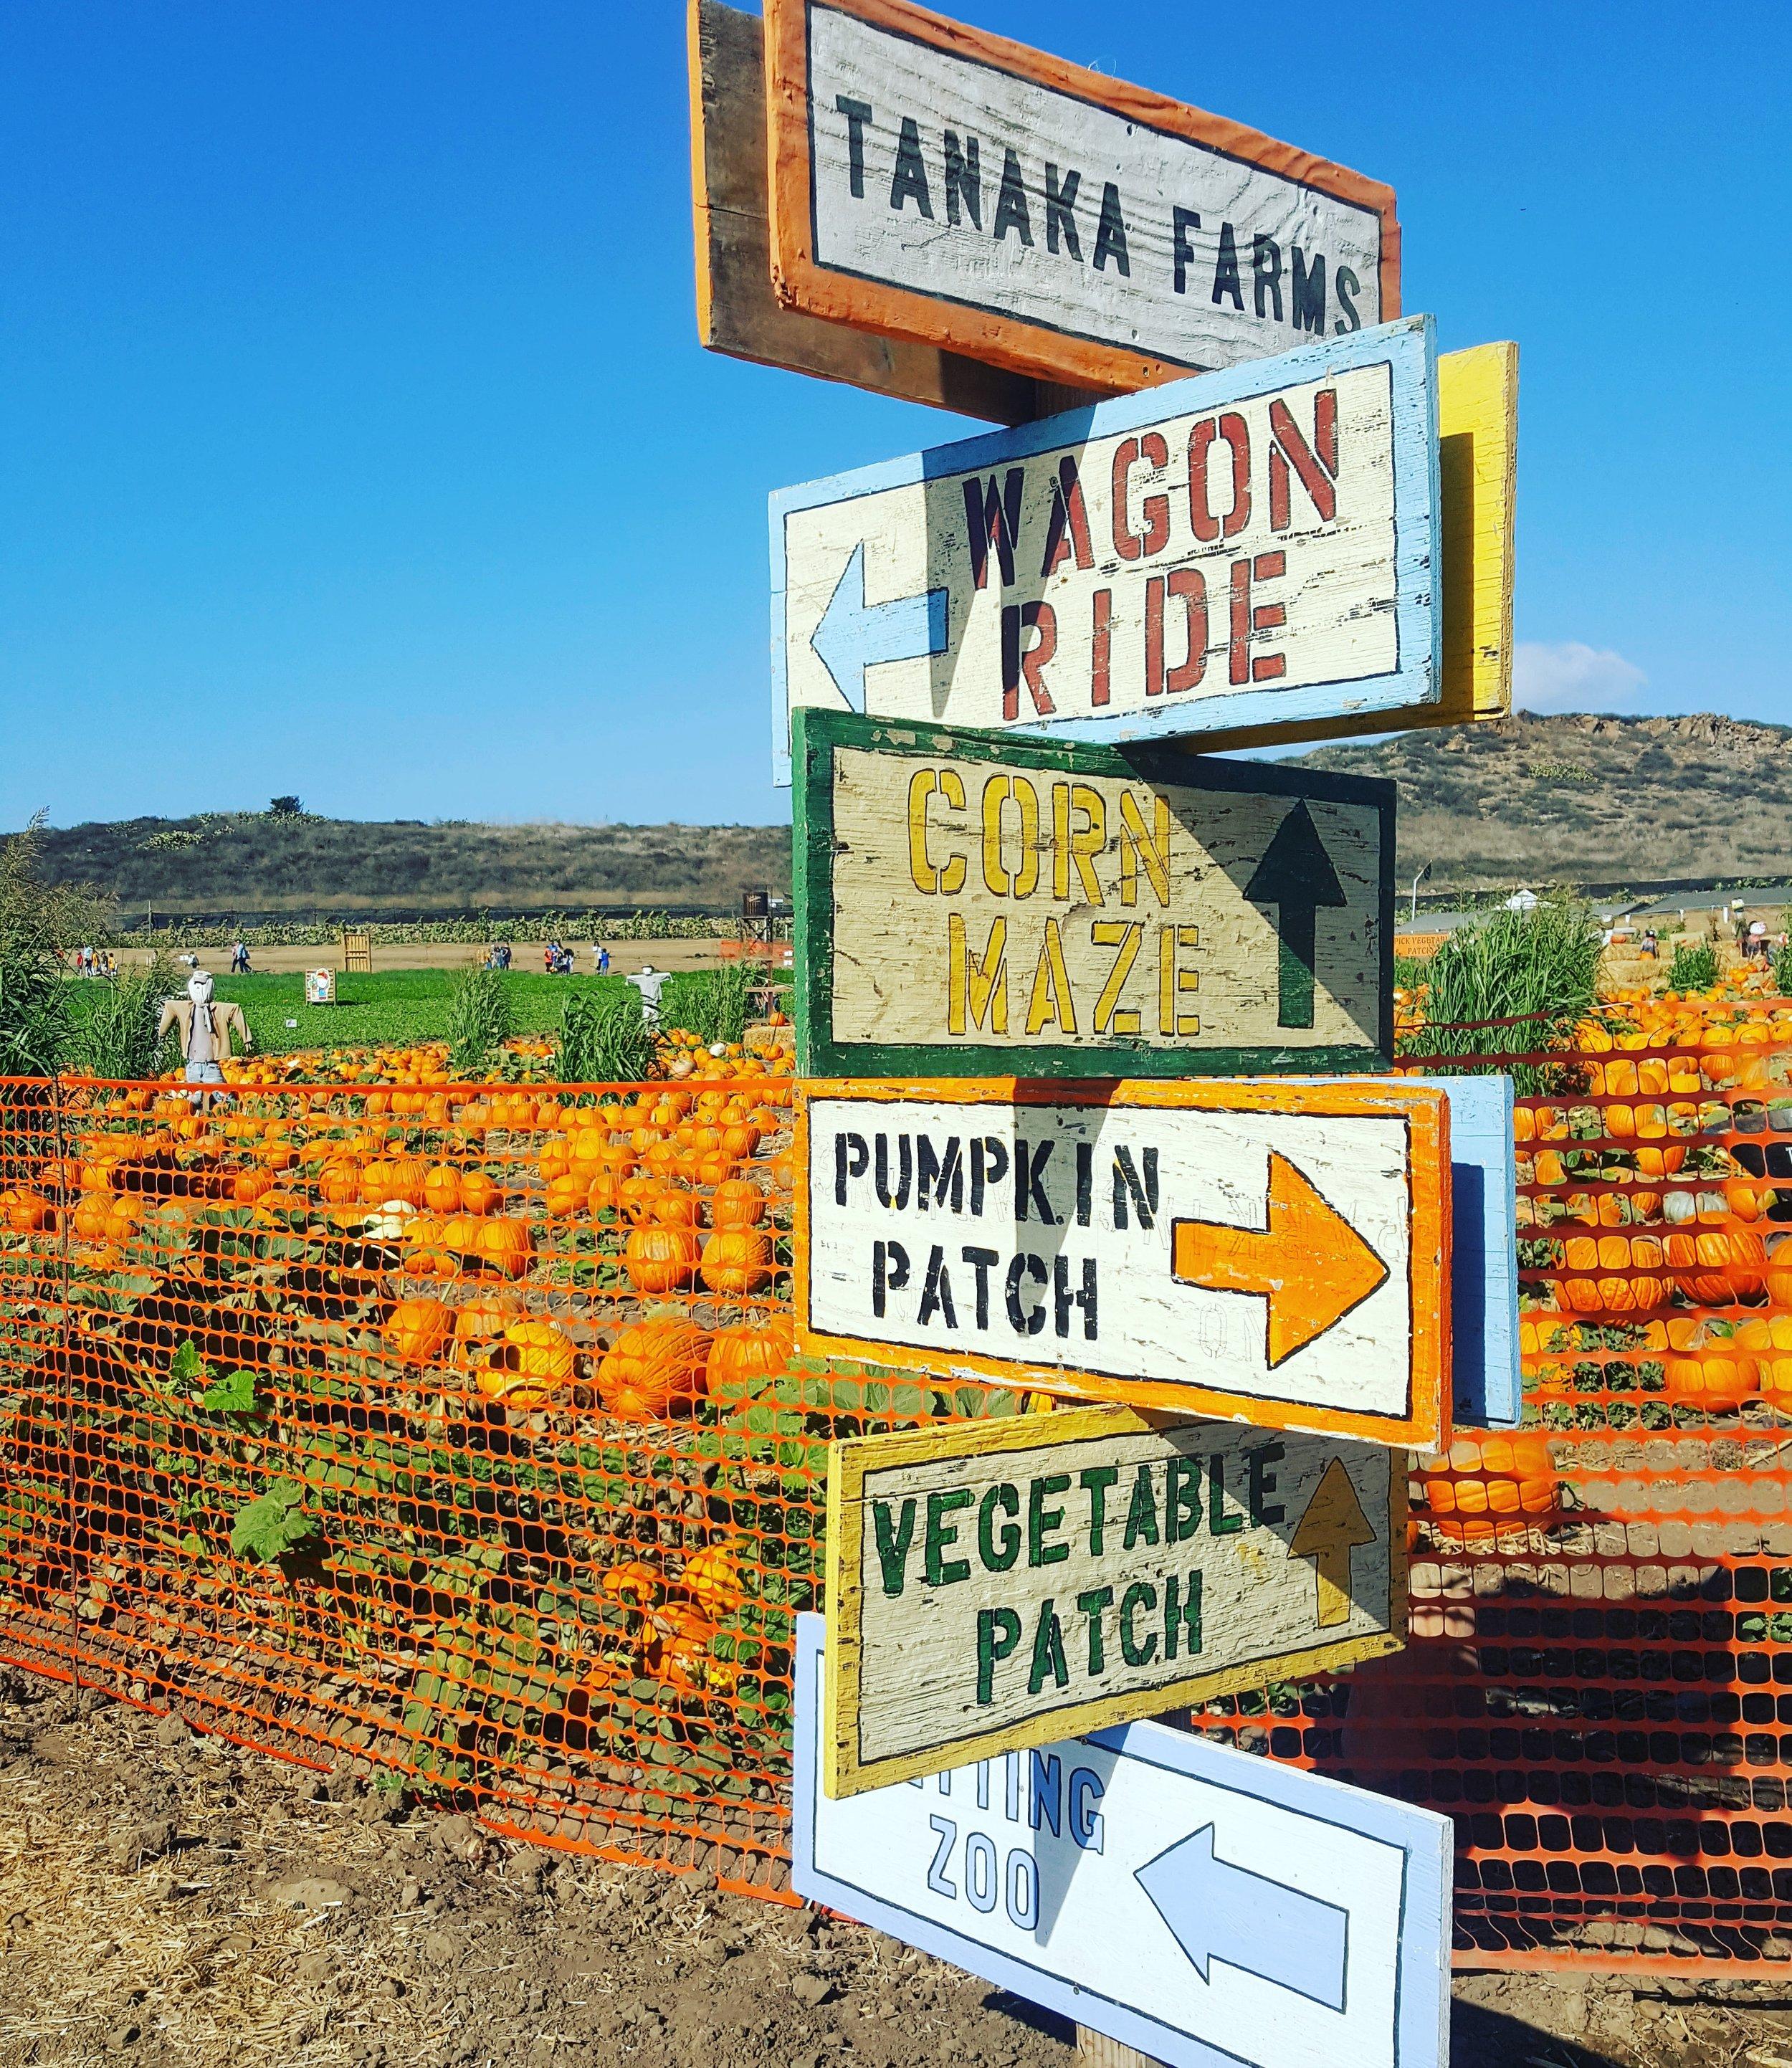 Tanaka Farms' seasonal pumpkin patch opens September 21, 2019.